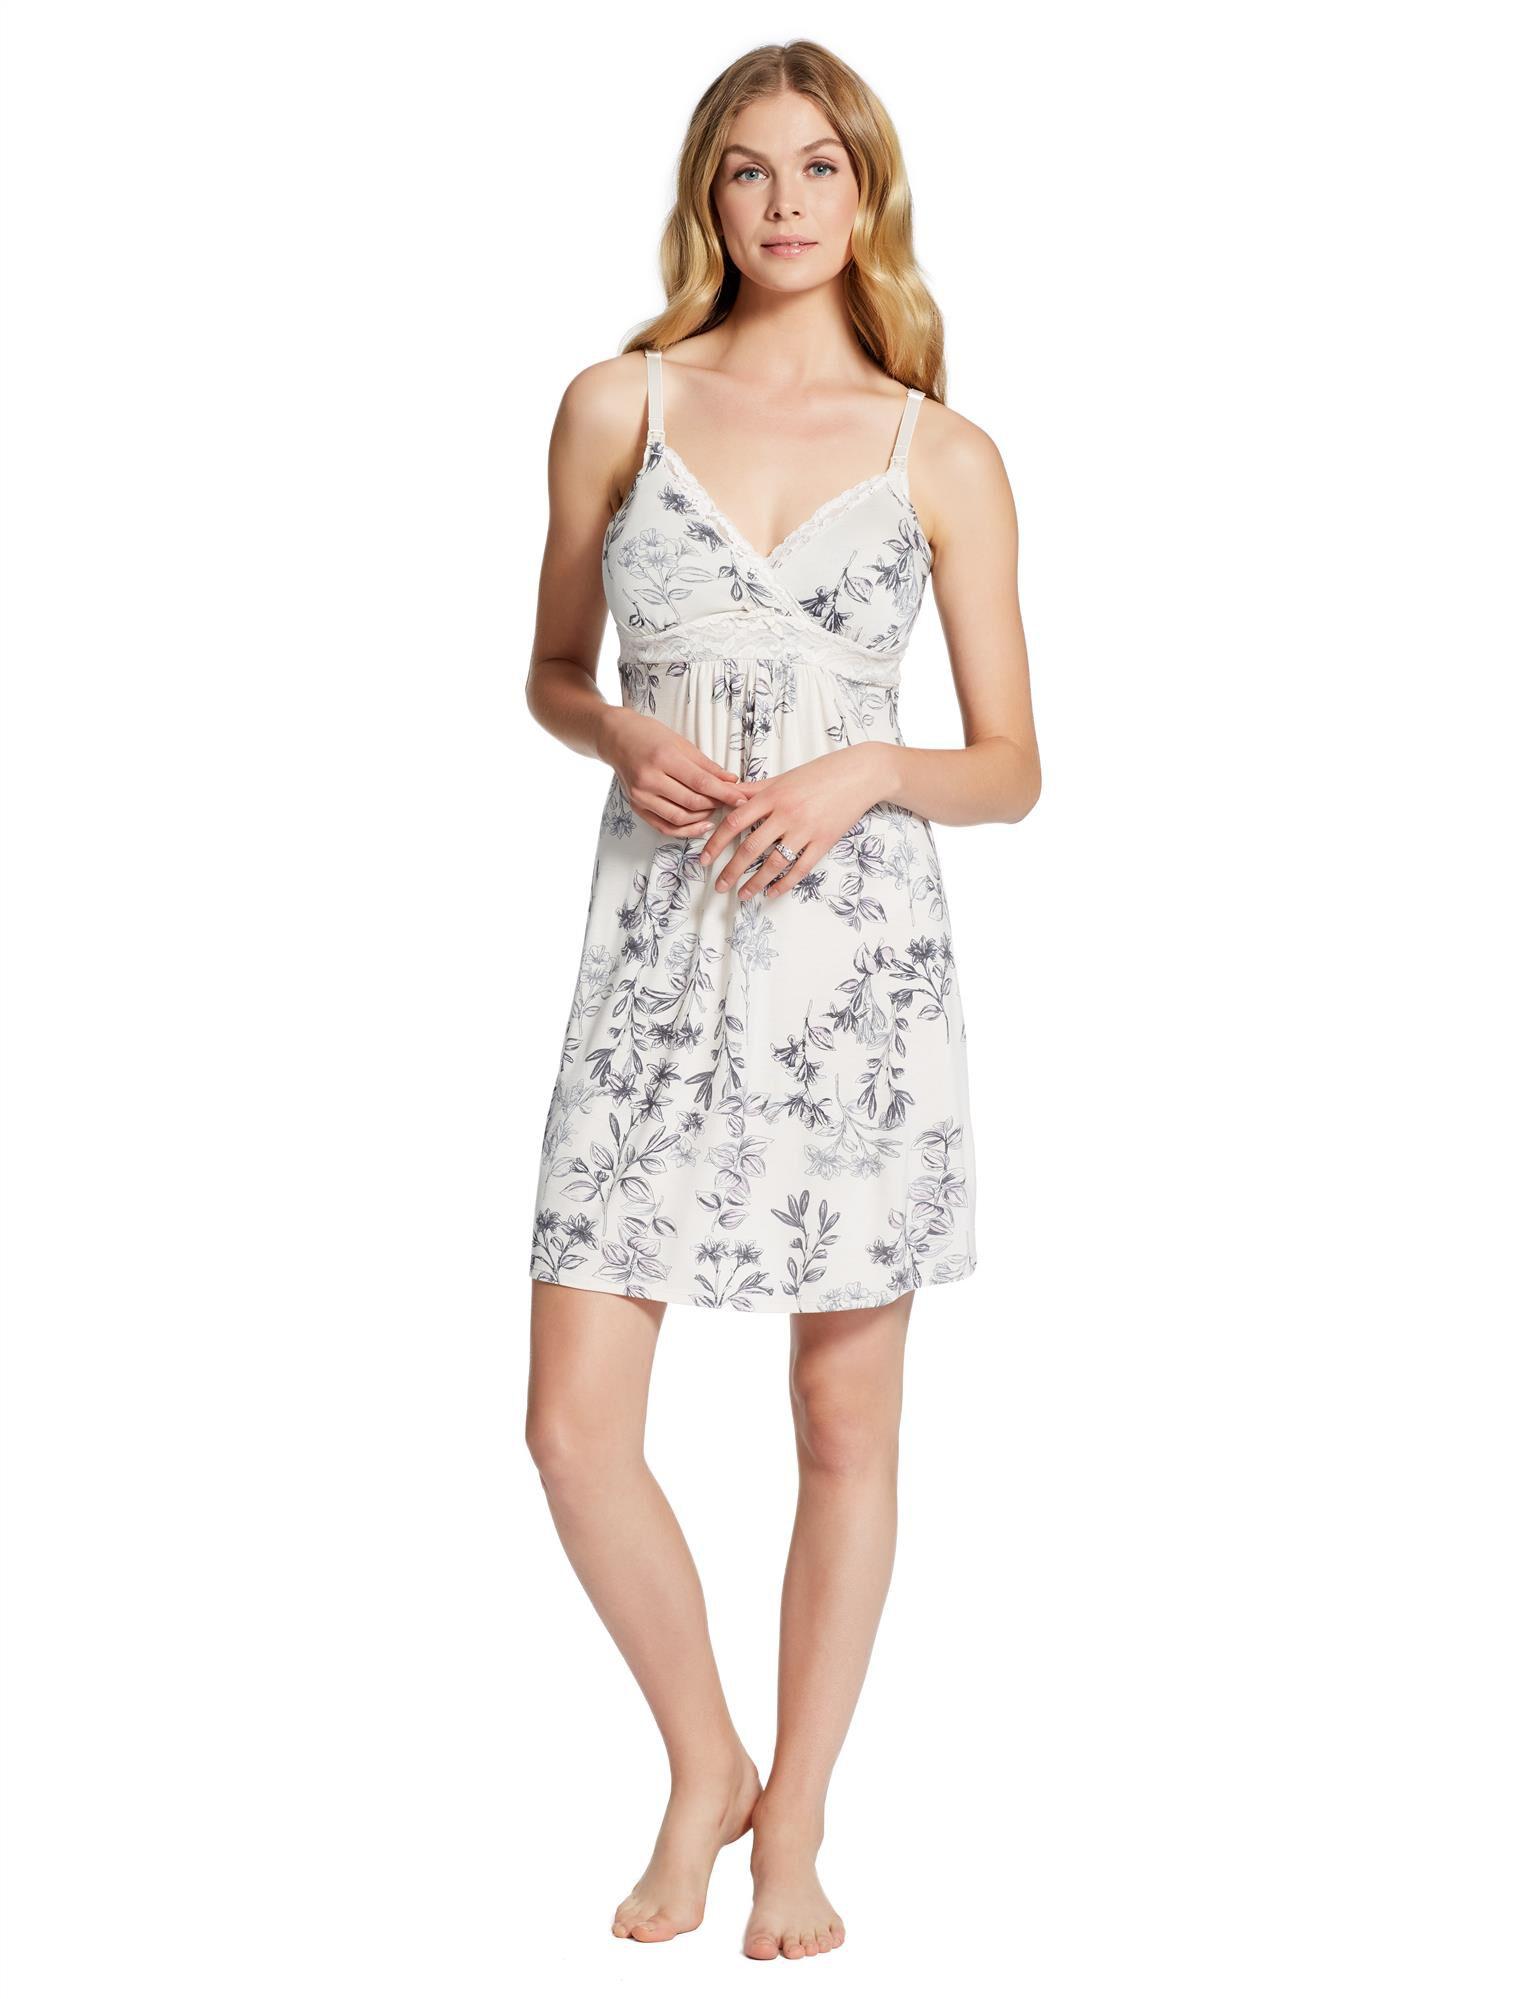 Jessica Simpson Lace Nursing Nightgown- Floral